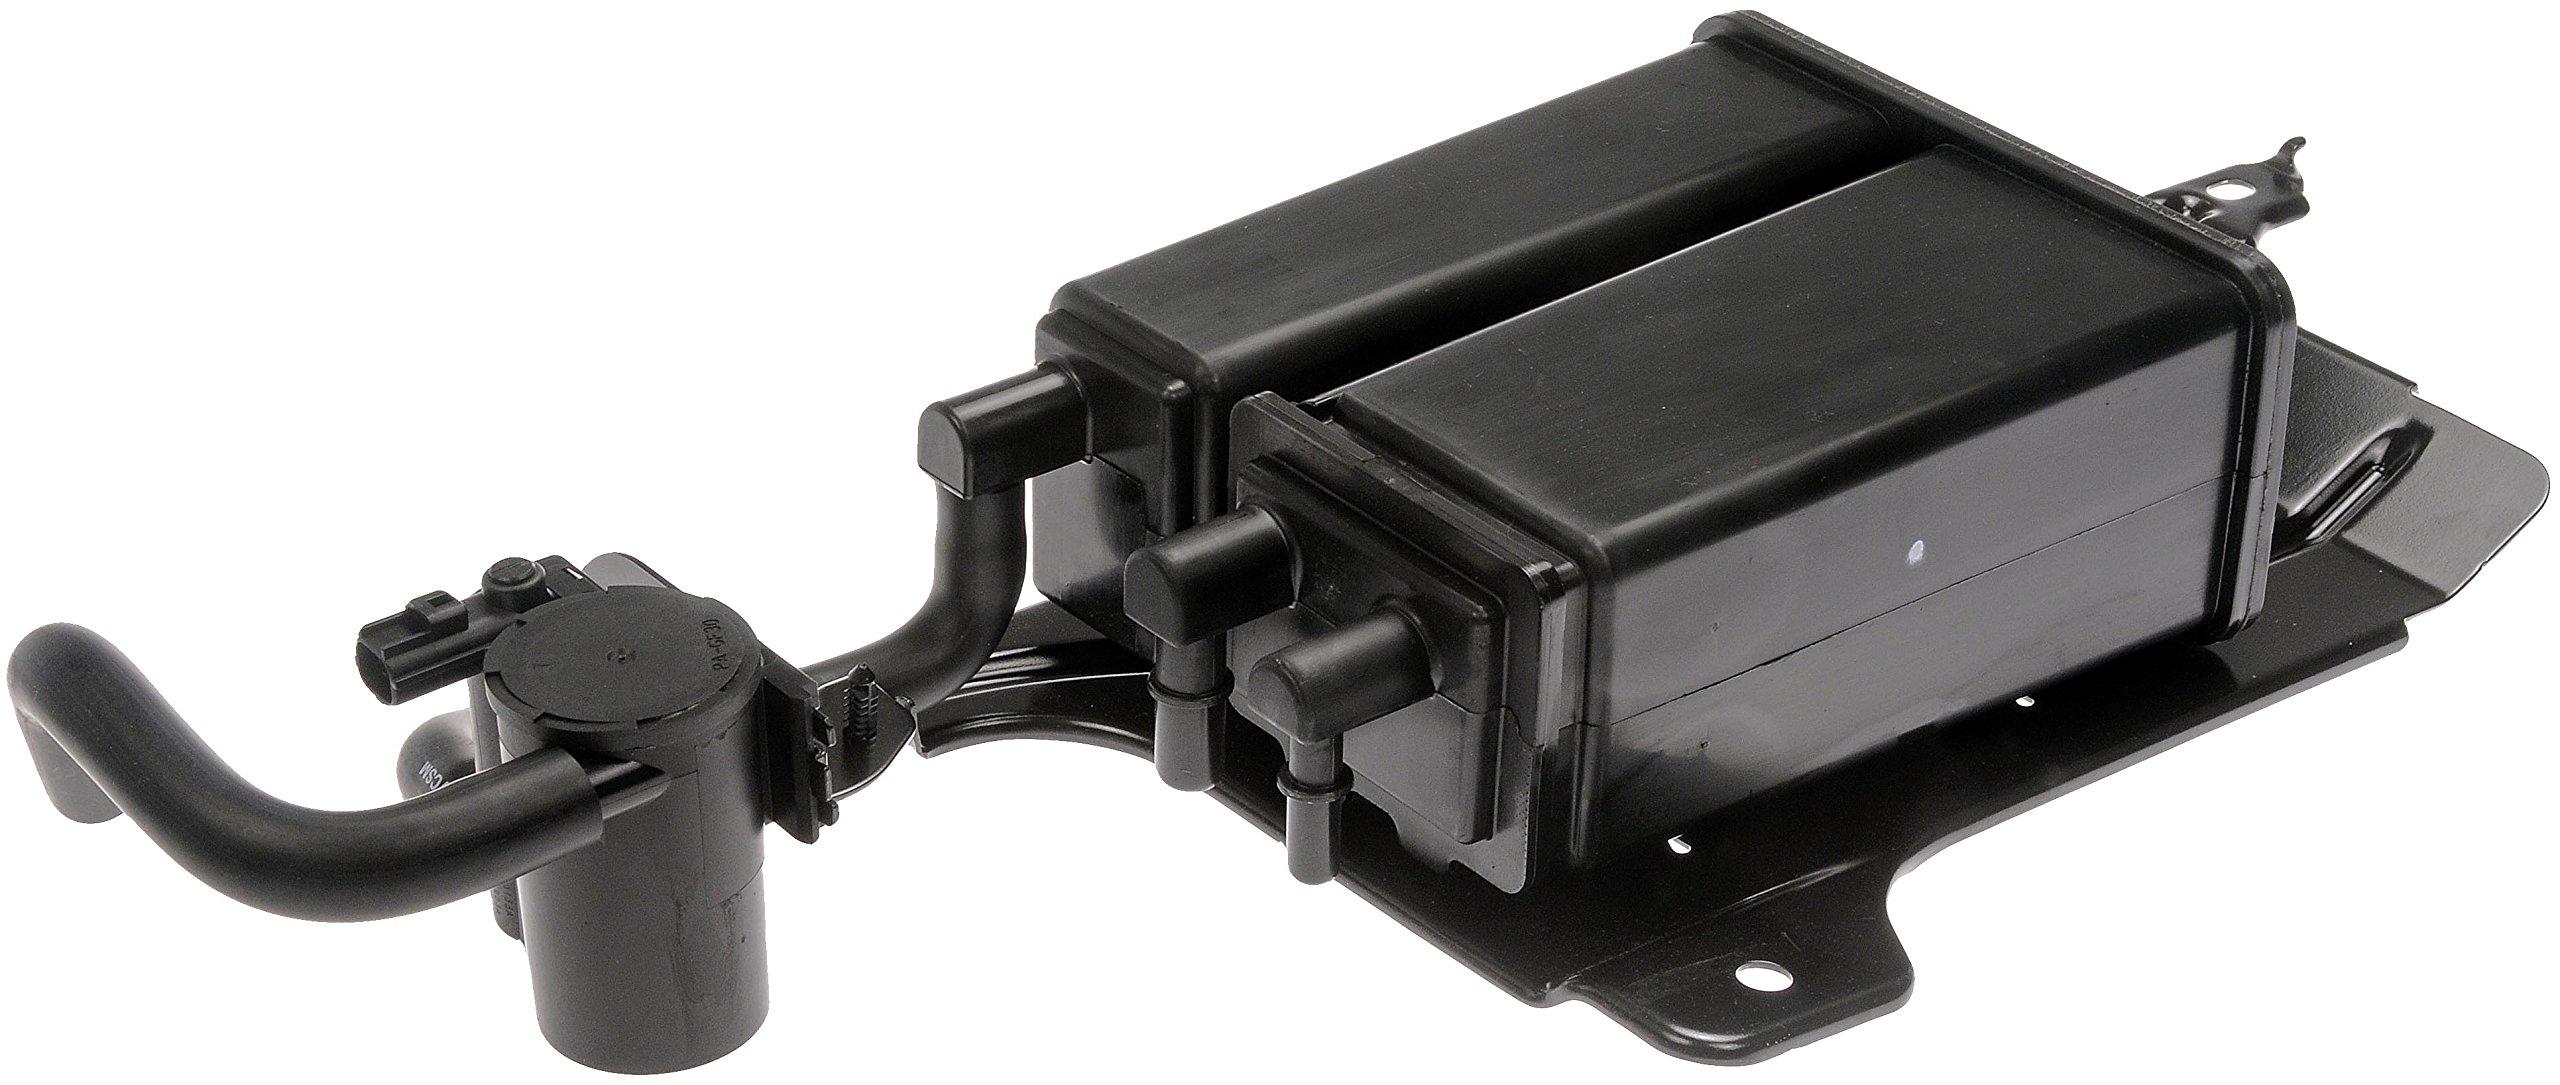 Dorman 911-310 Evaporative Fuel Vapor Canister by Dorman